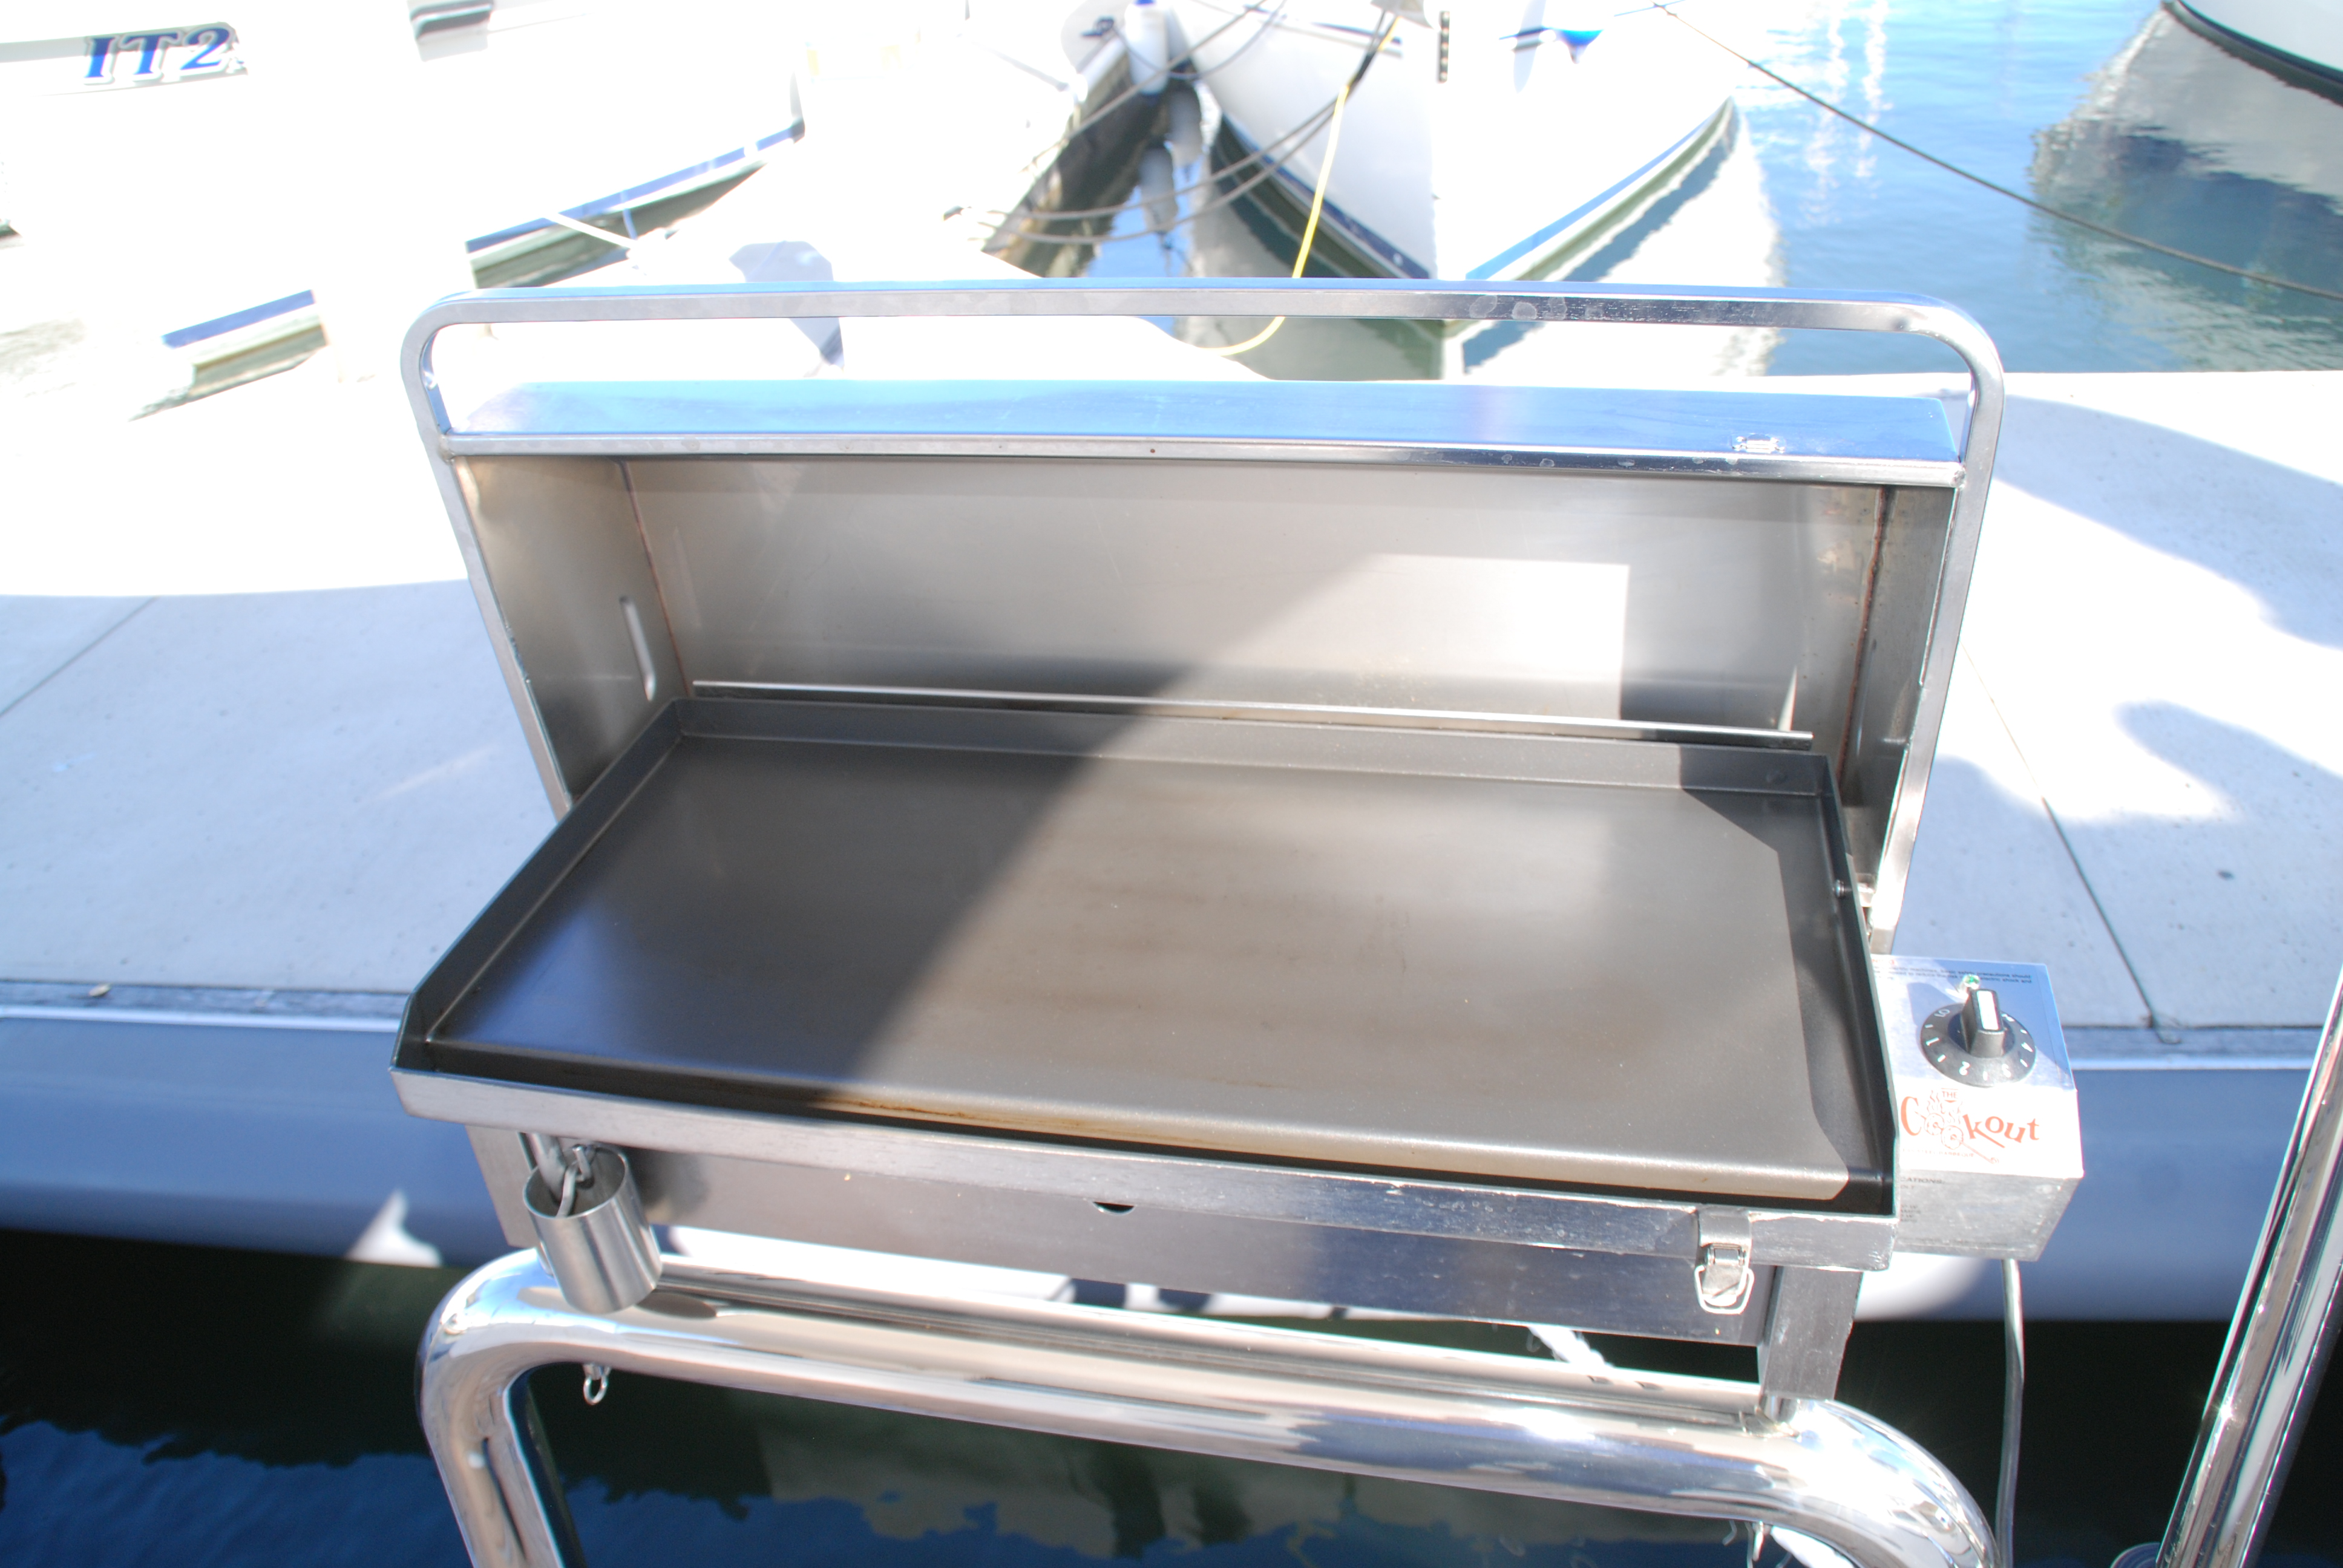 Stainless Steel Marine Grade BBQ